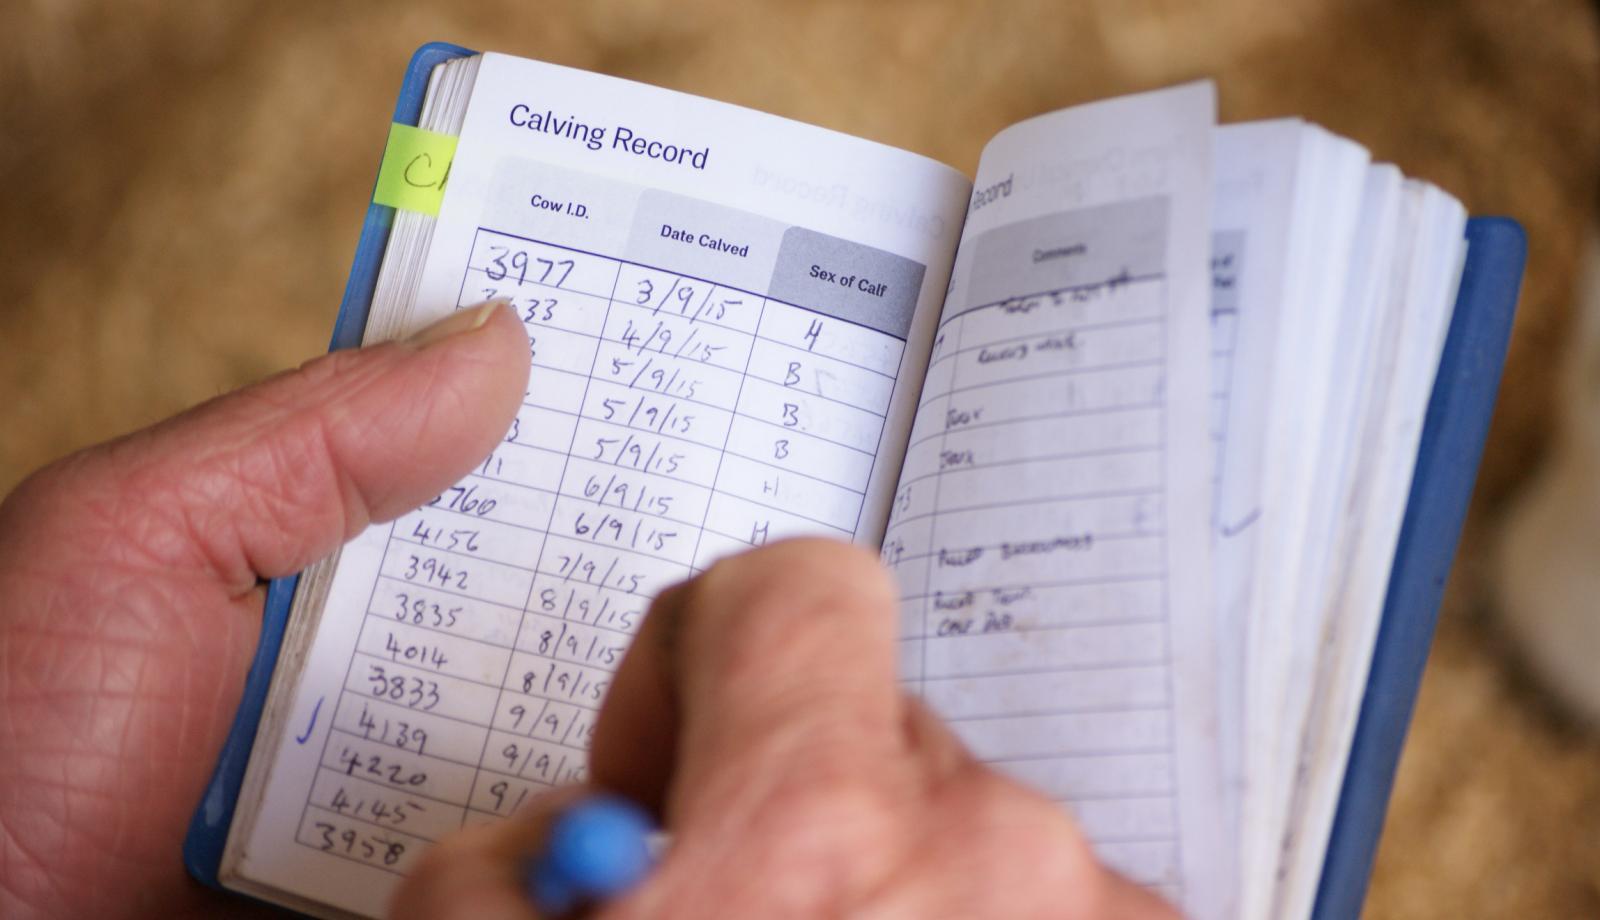 Don't delay calf records